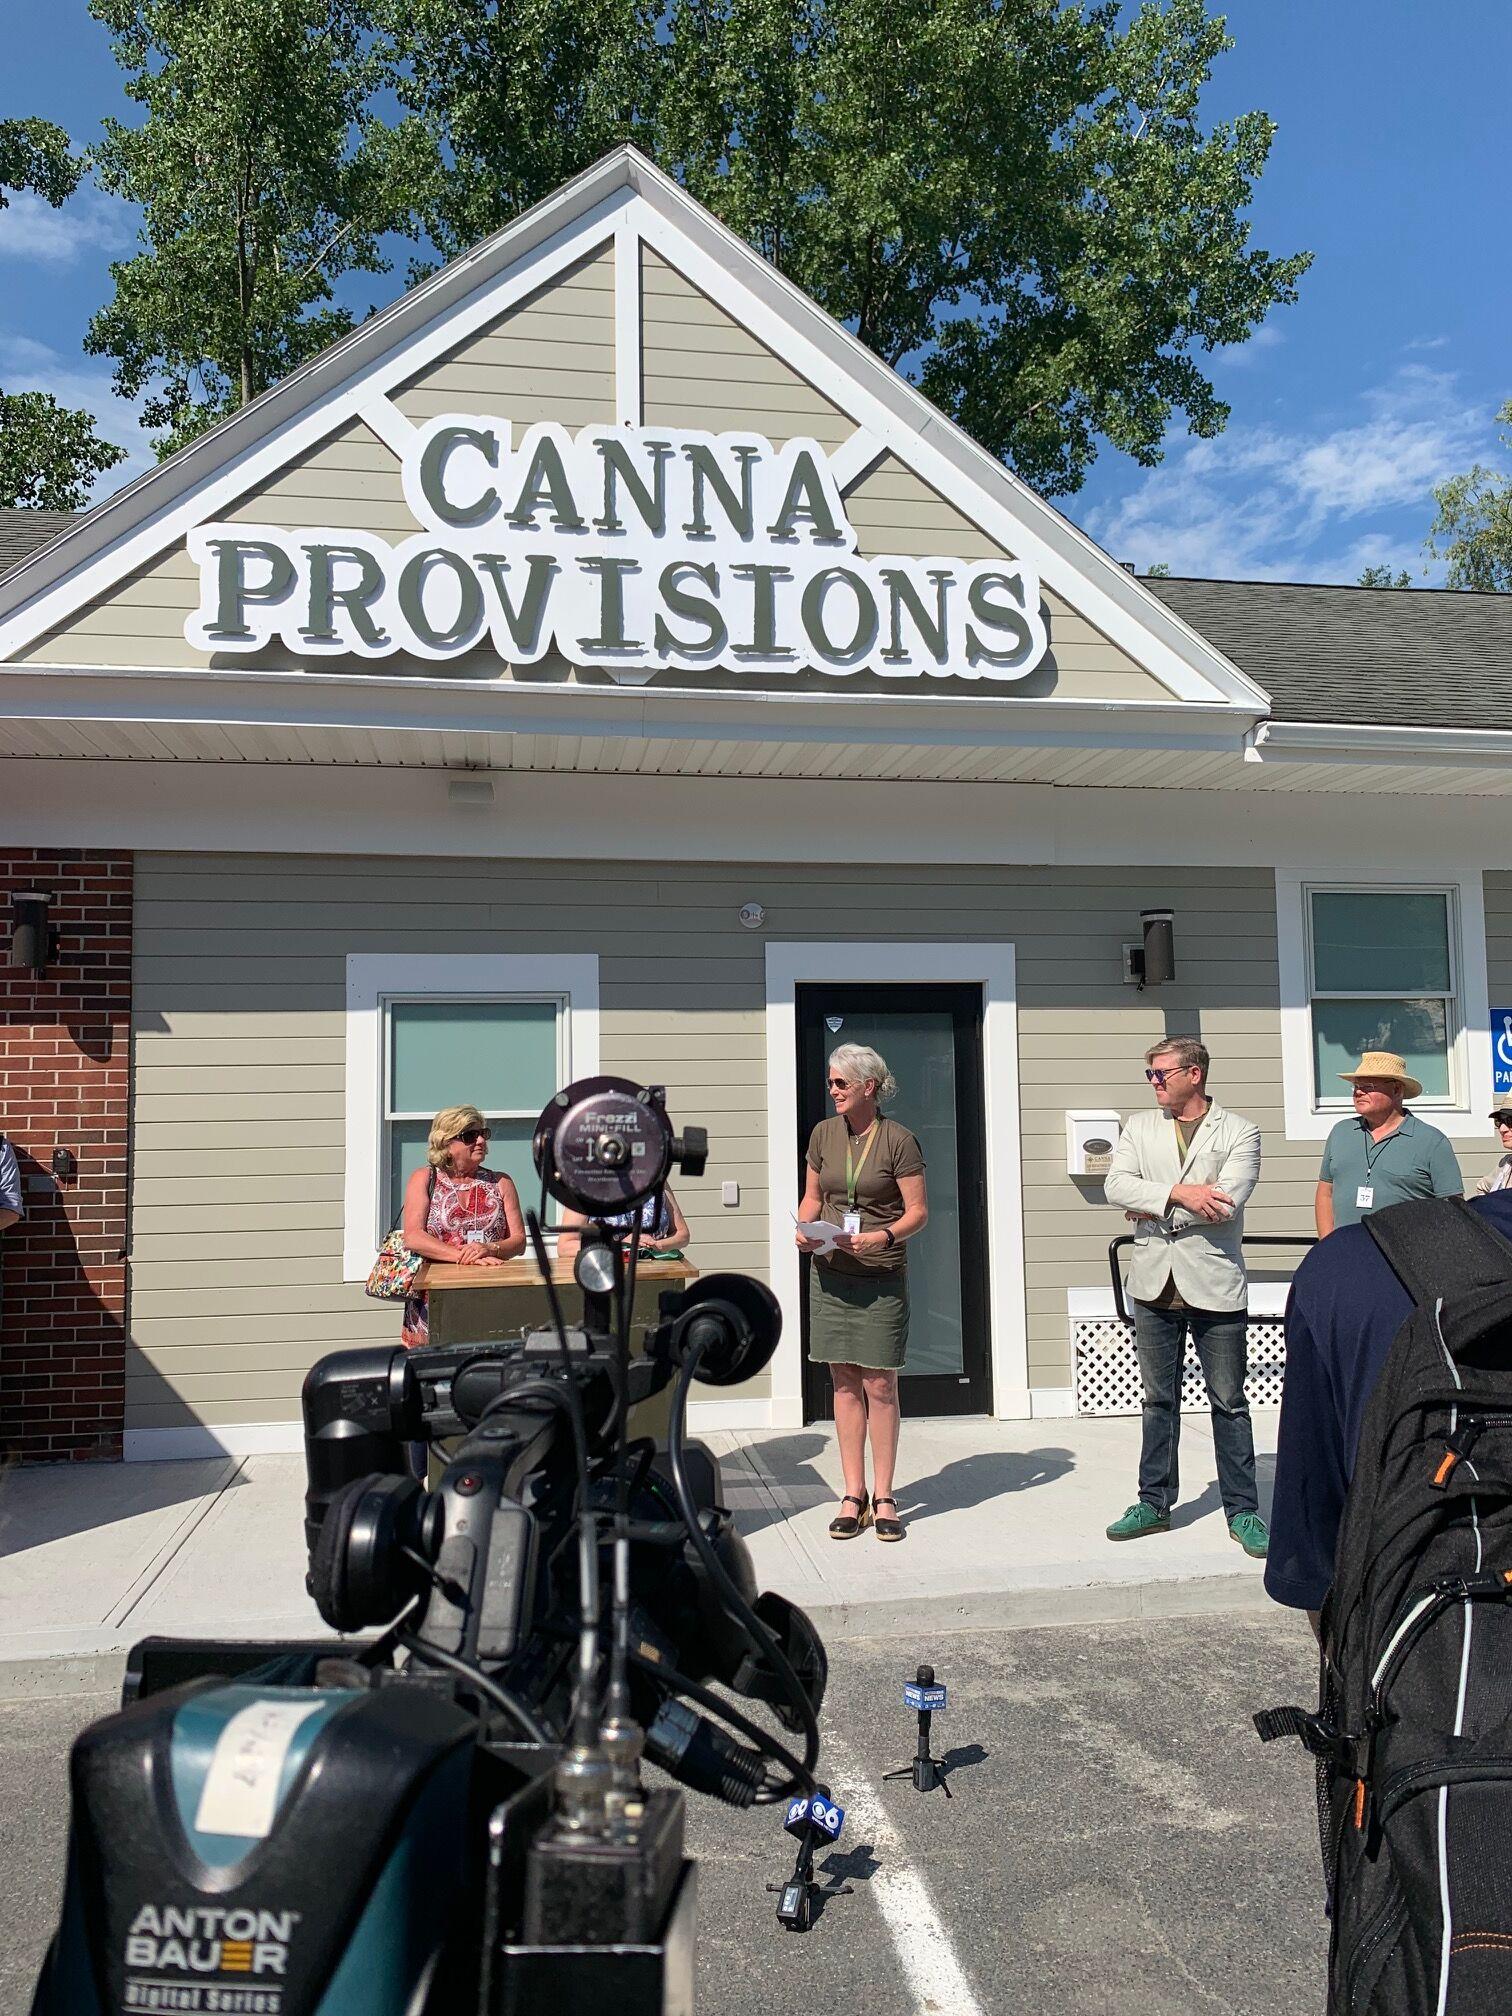 Marijuana dispensaries near Capital Region on the rise